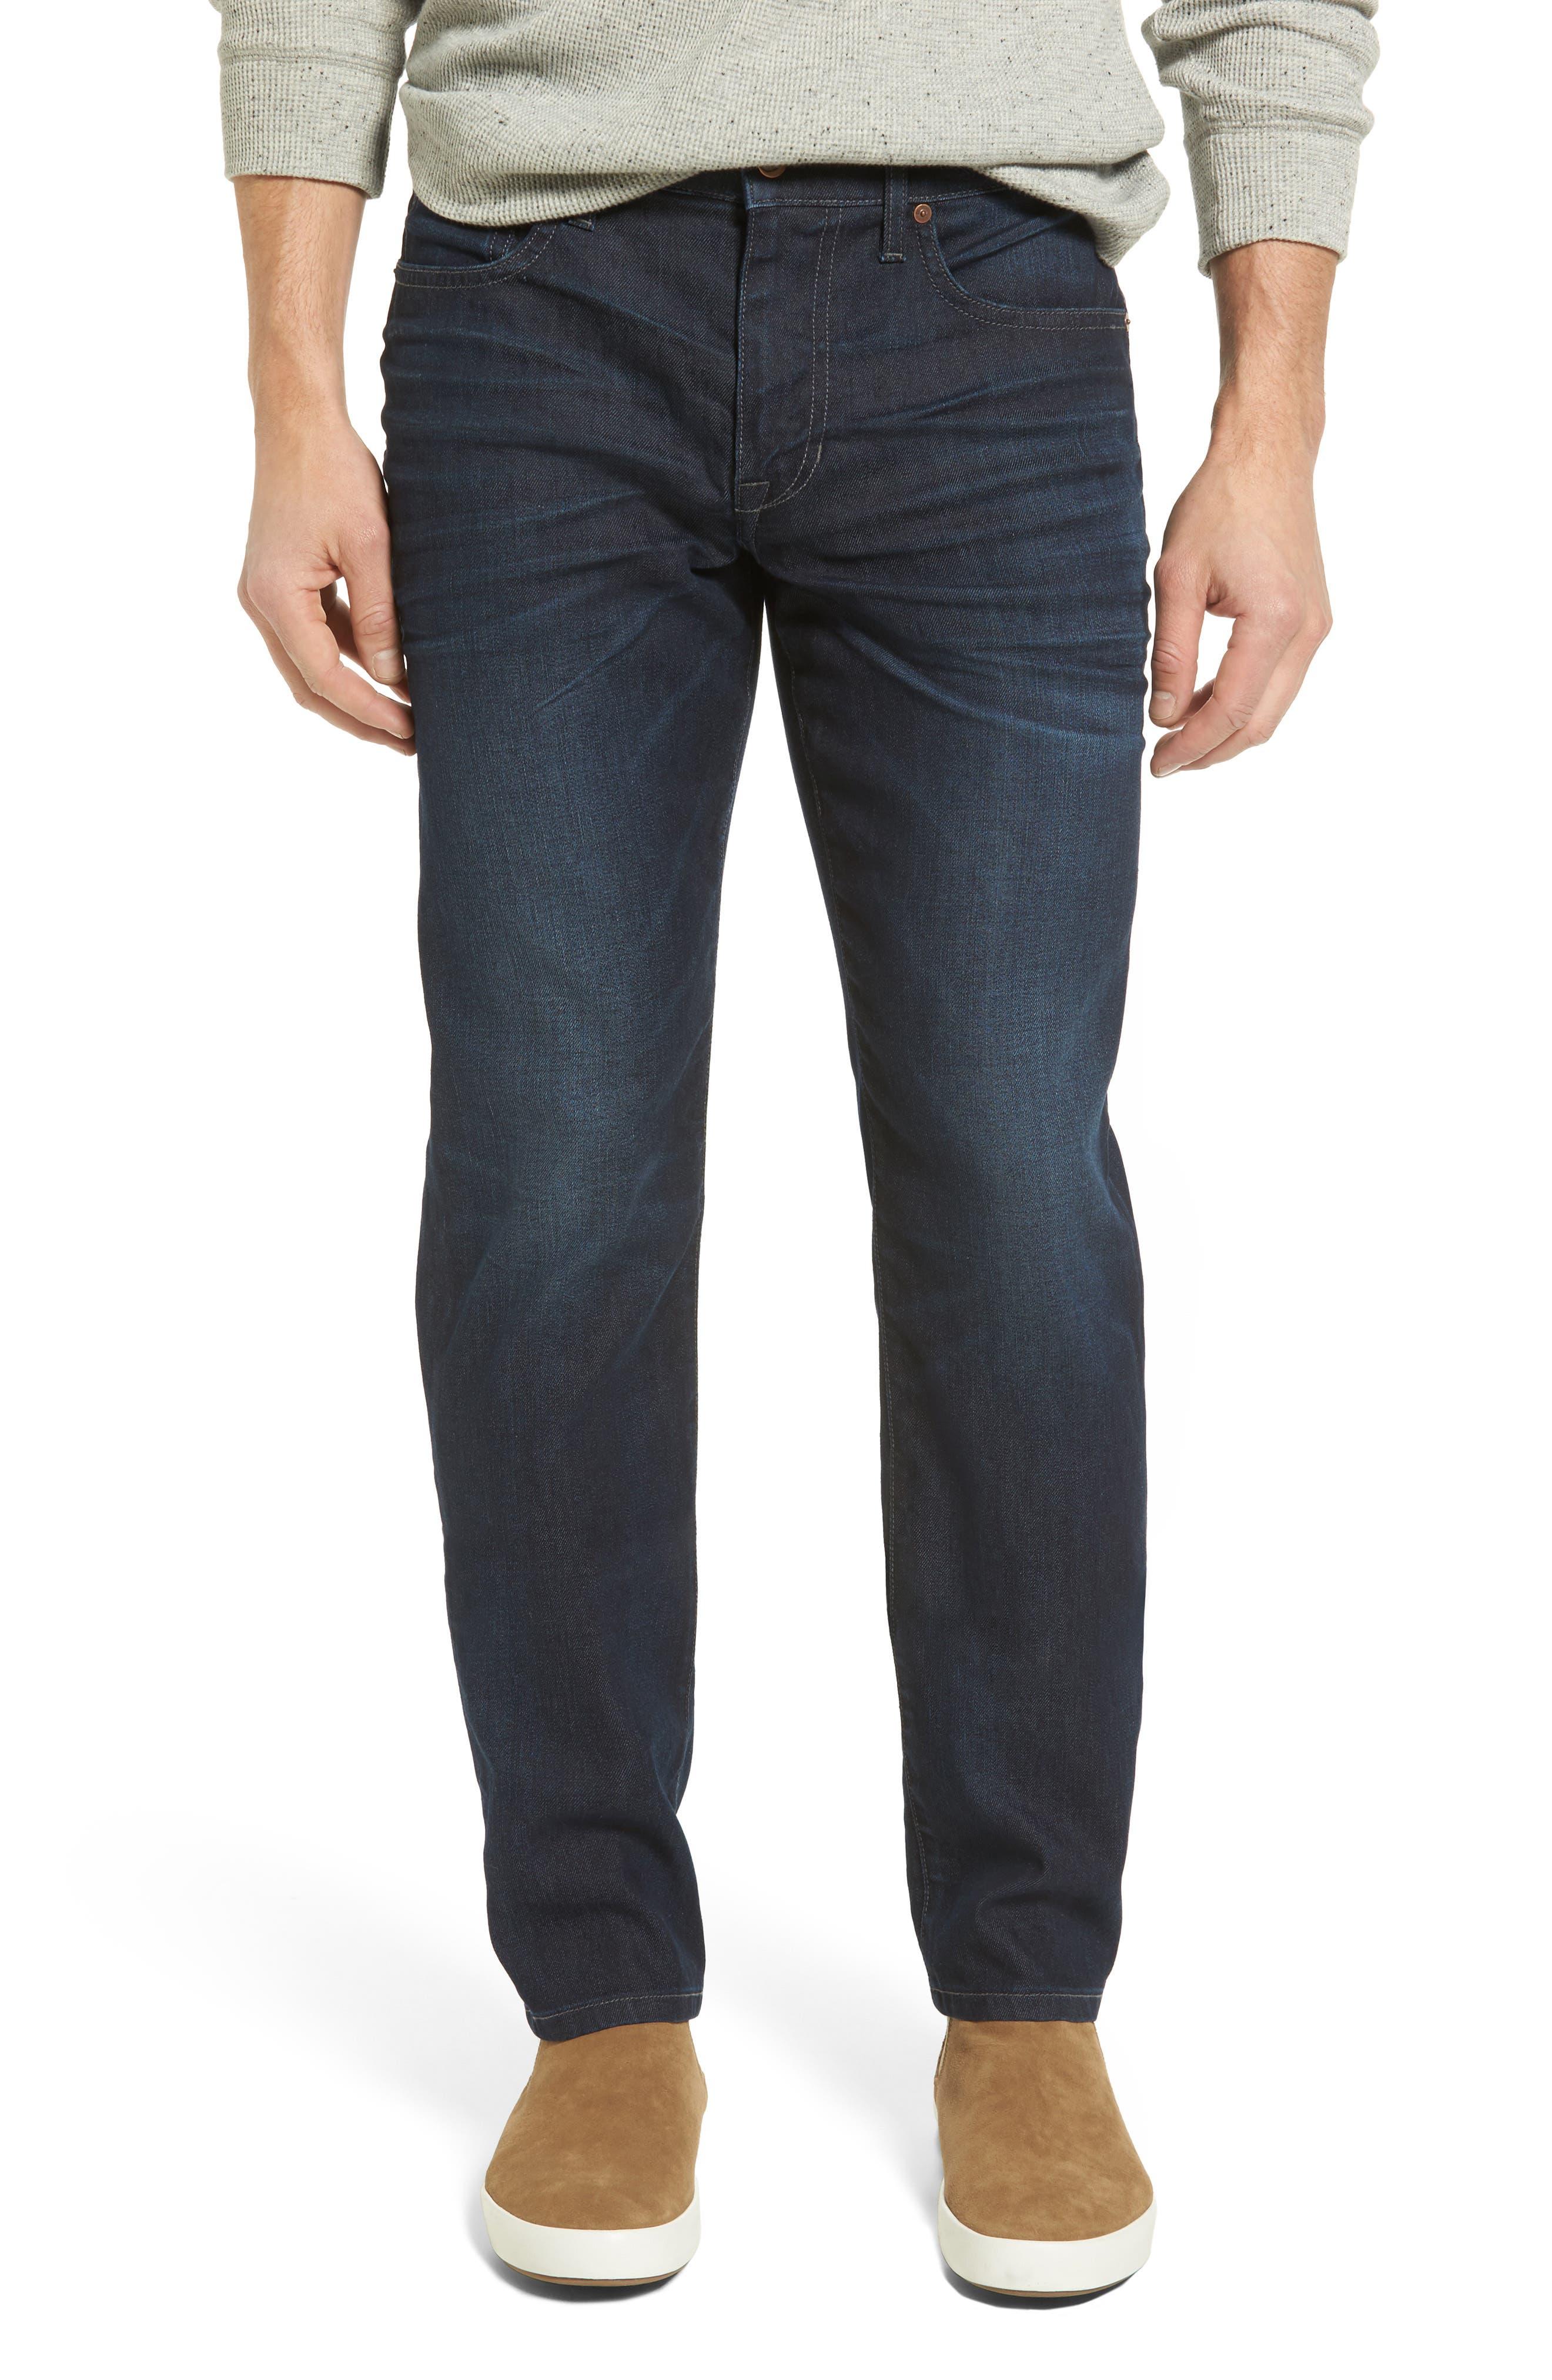 Brixton Slim Straight Leg Jeans,                             Main thumbnail 1, color,                             430